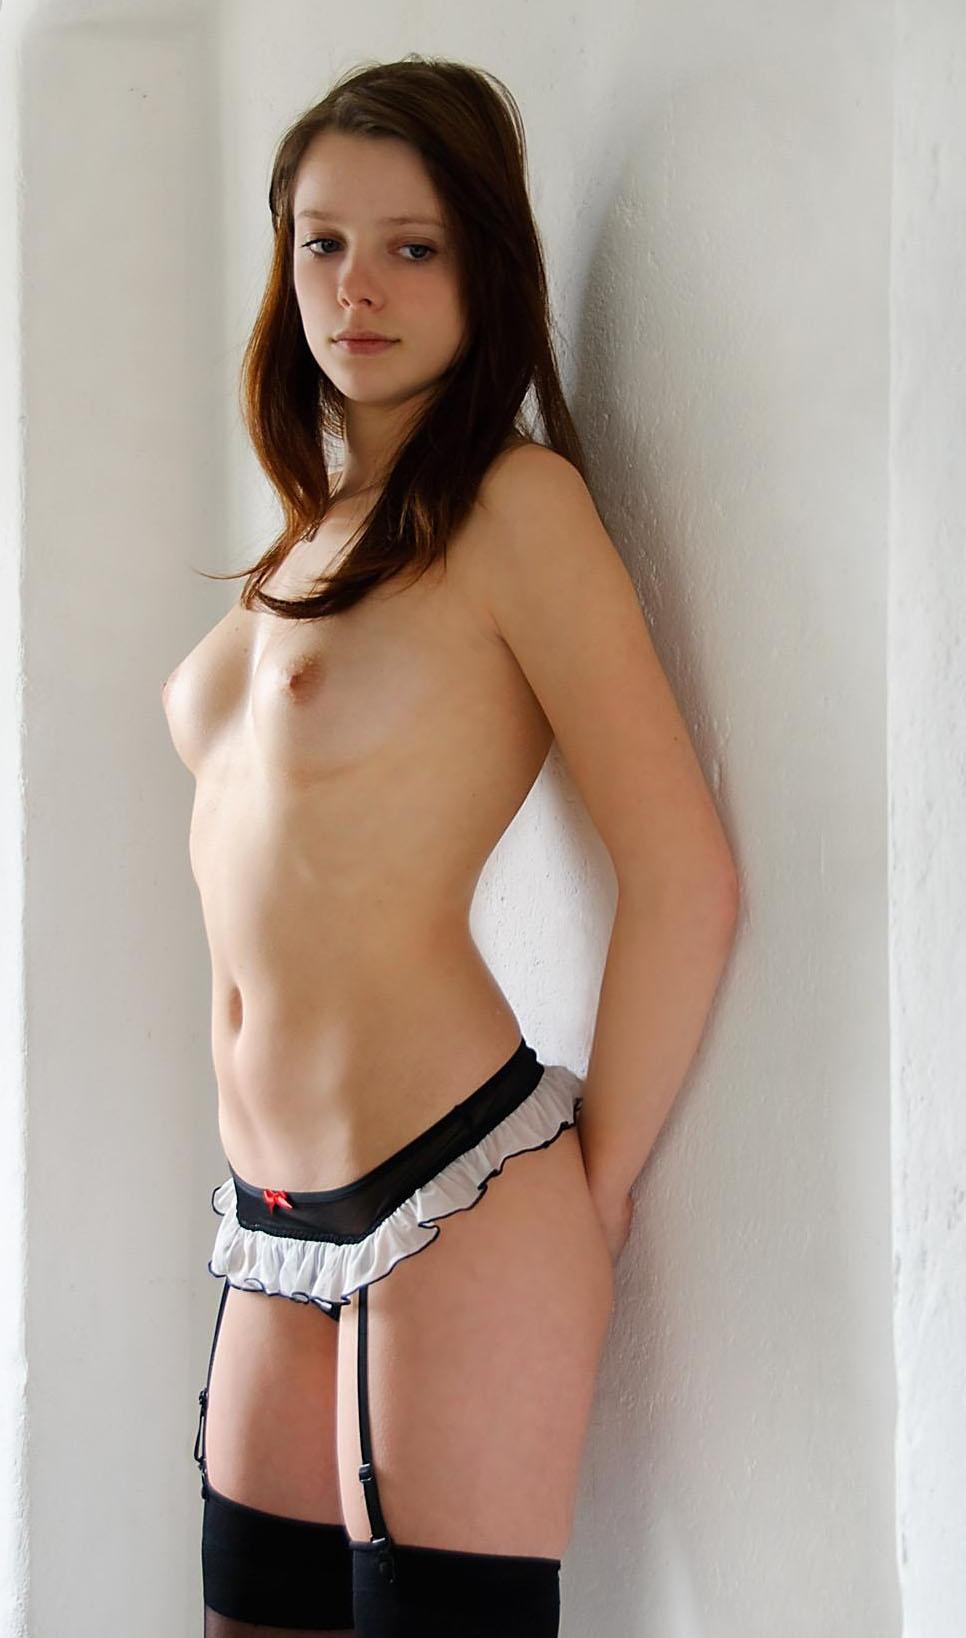 Nackt anne fotos wünsche Anne Wuensche